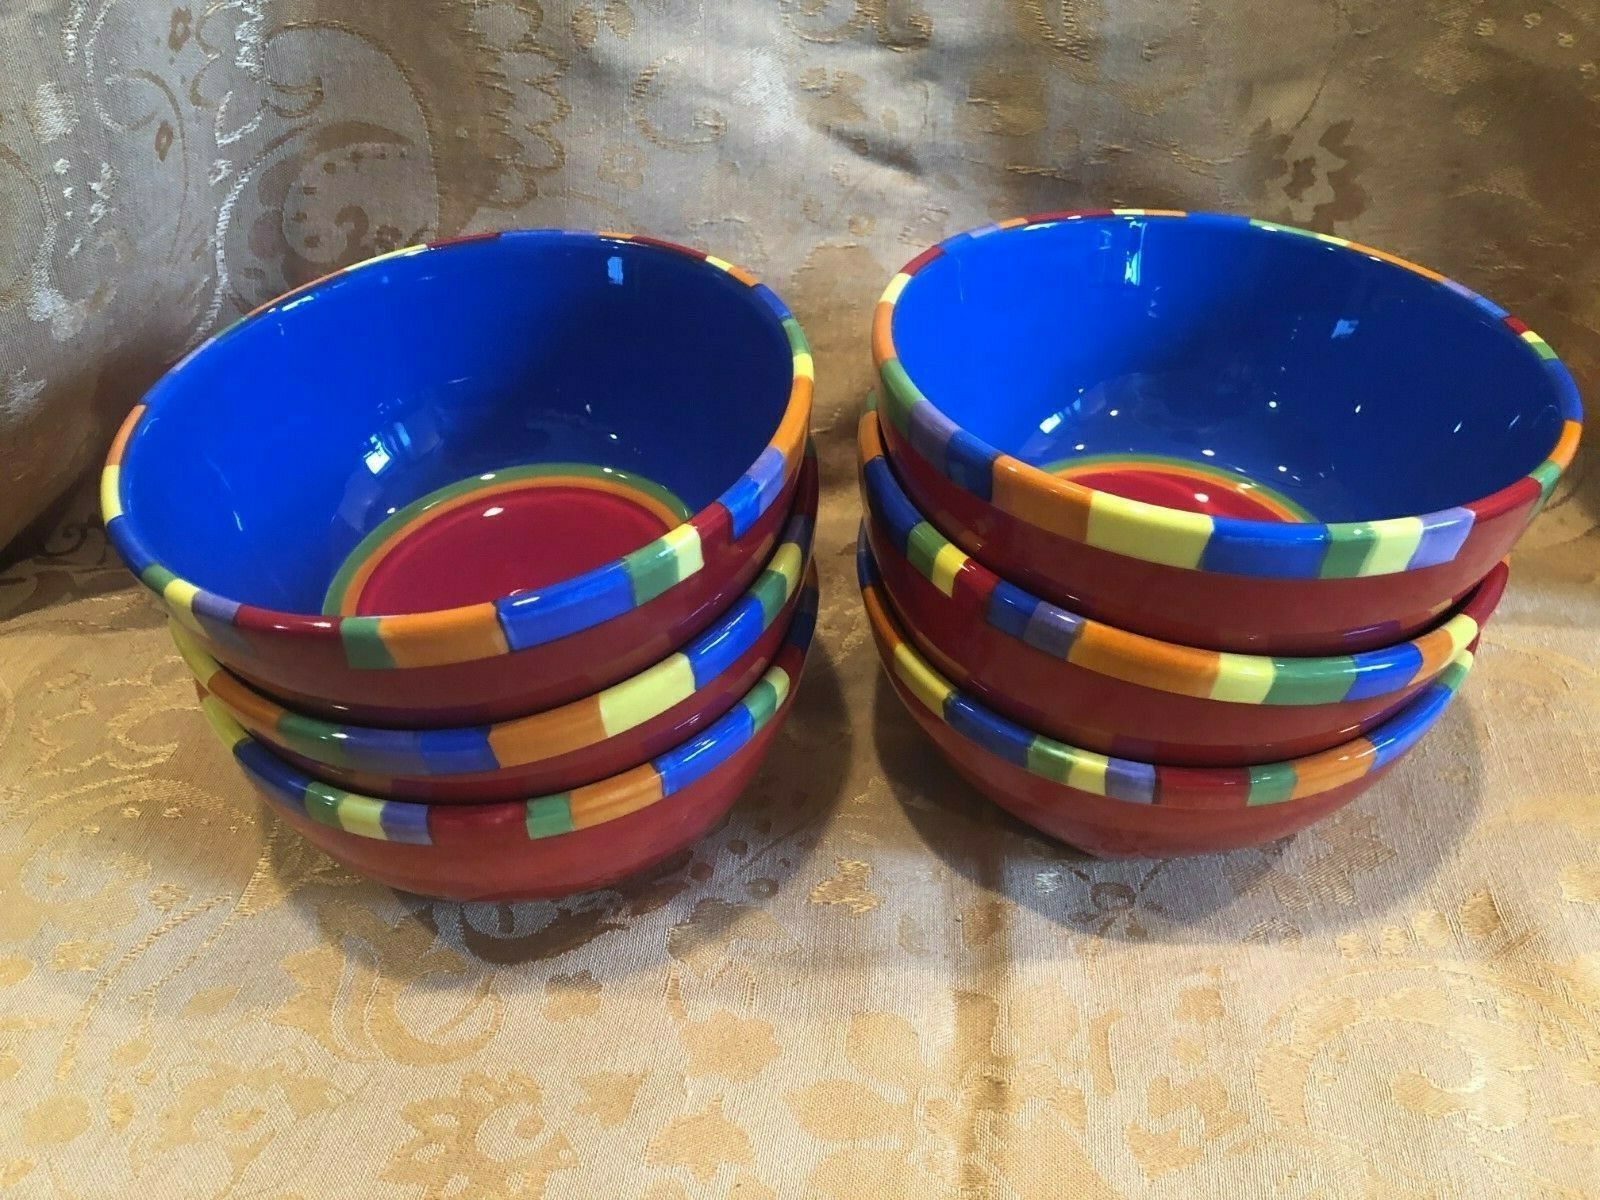 Dansk Caribe Antigua Stripe - 6 Soup Cereal Bowls - Blue, Red & Orange  - EUC! - $37.55